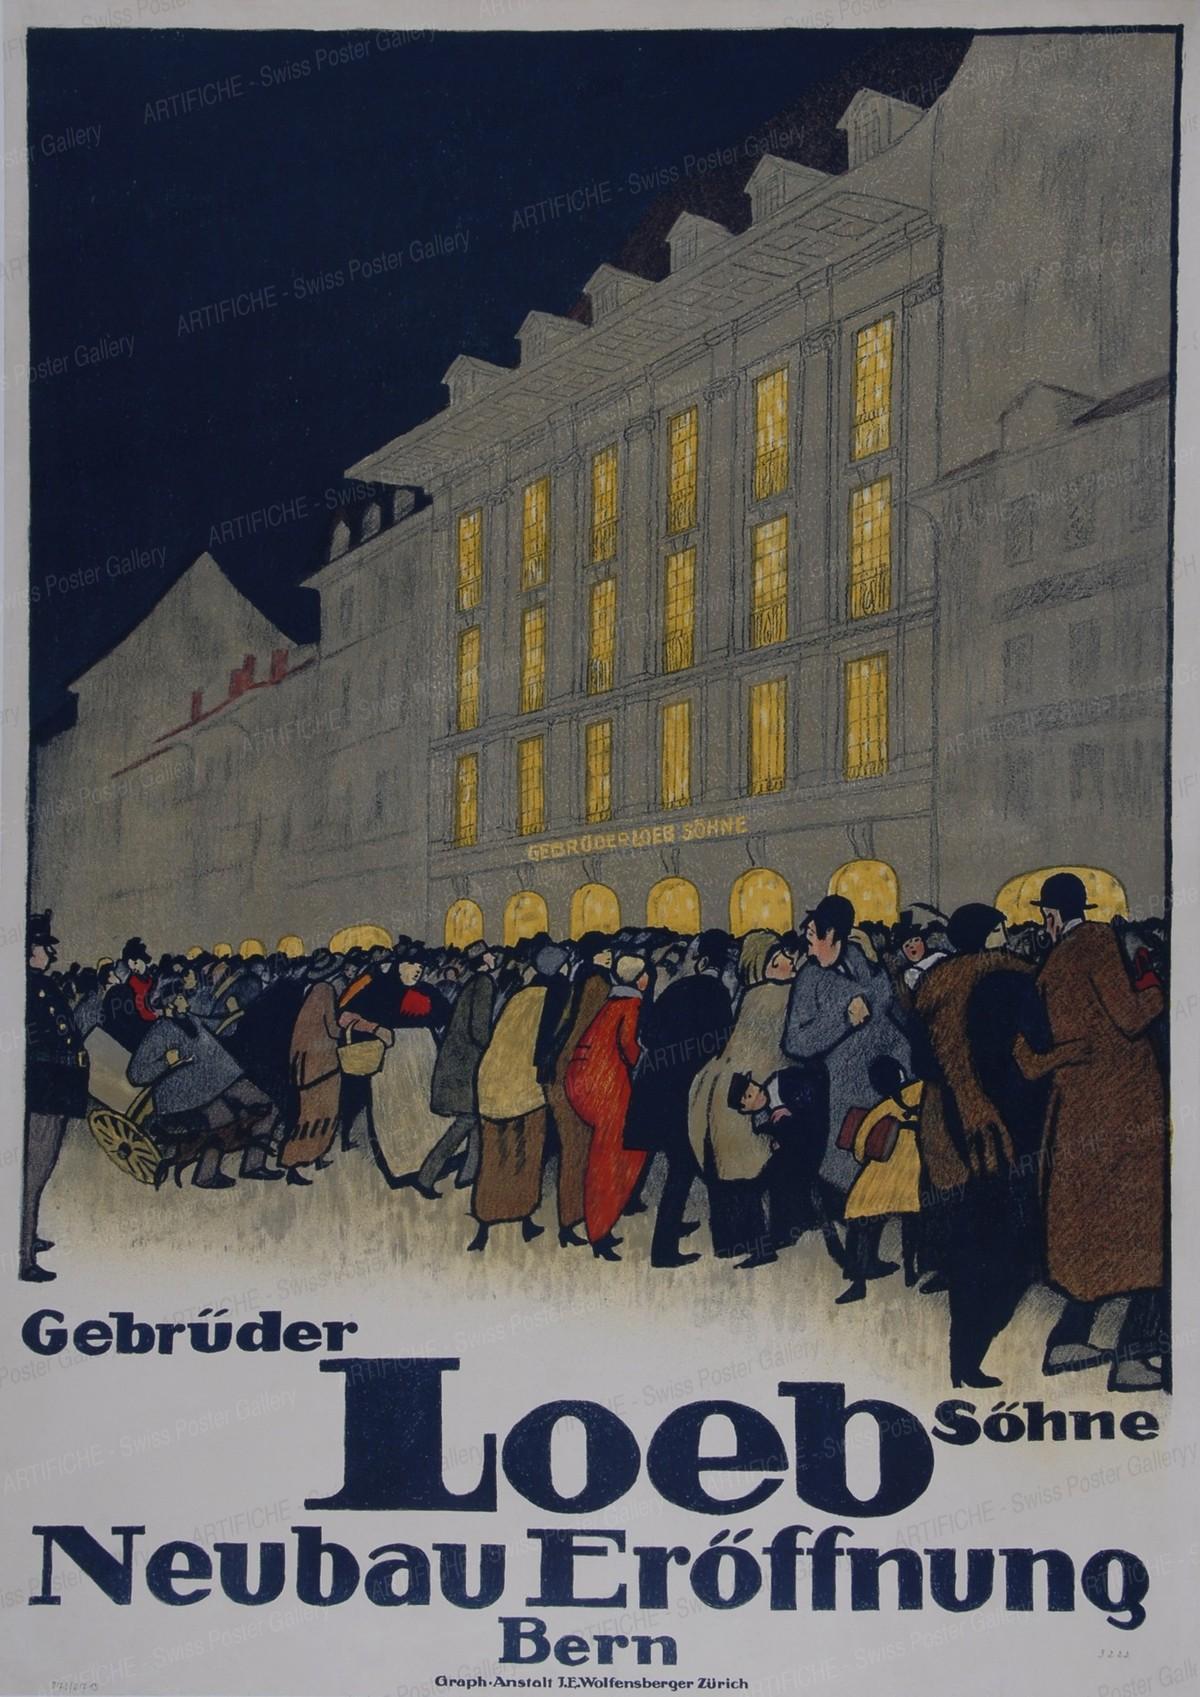 Opening of the Loeb Shop in Berne, Emil Cardinaux